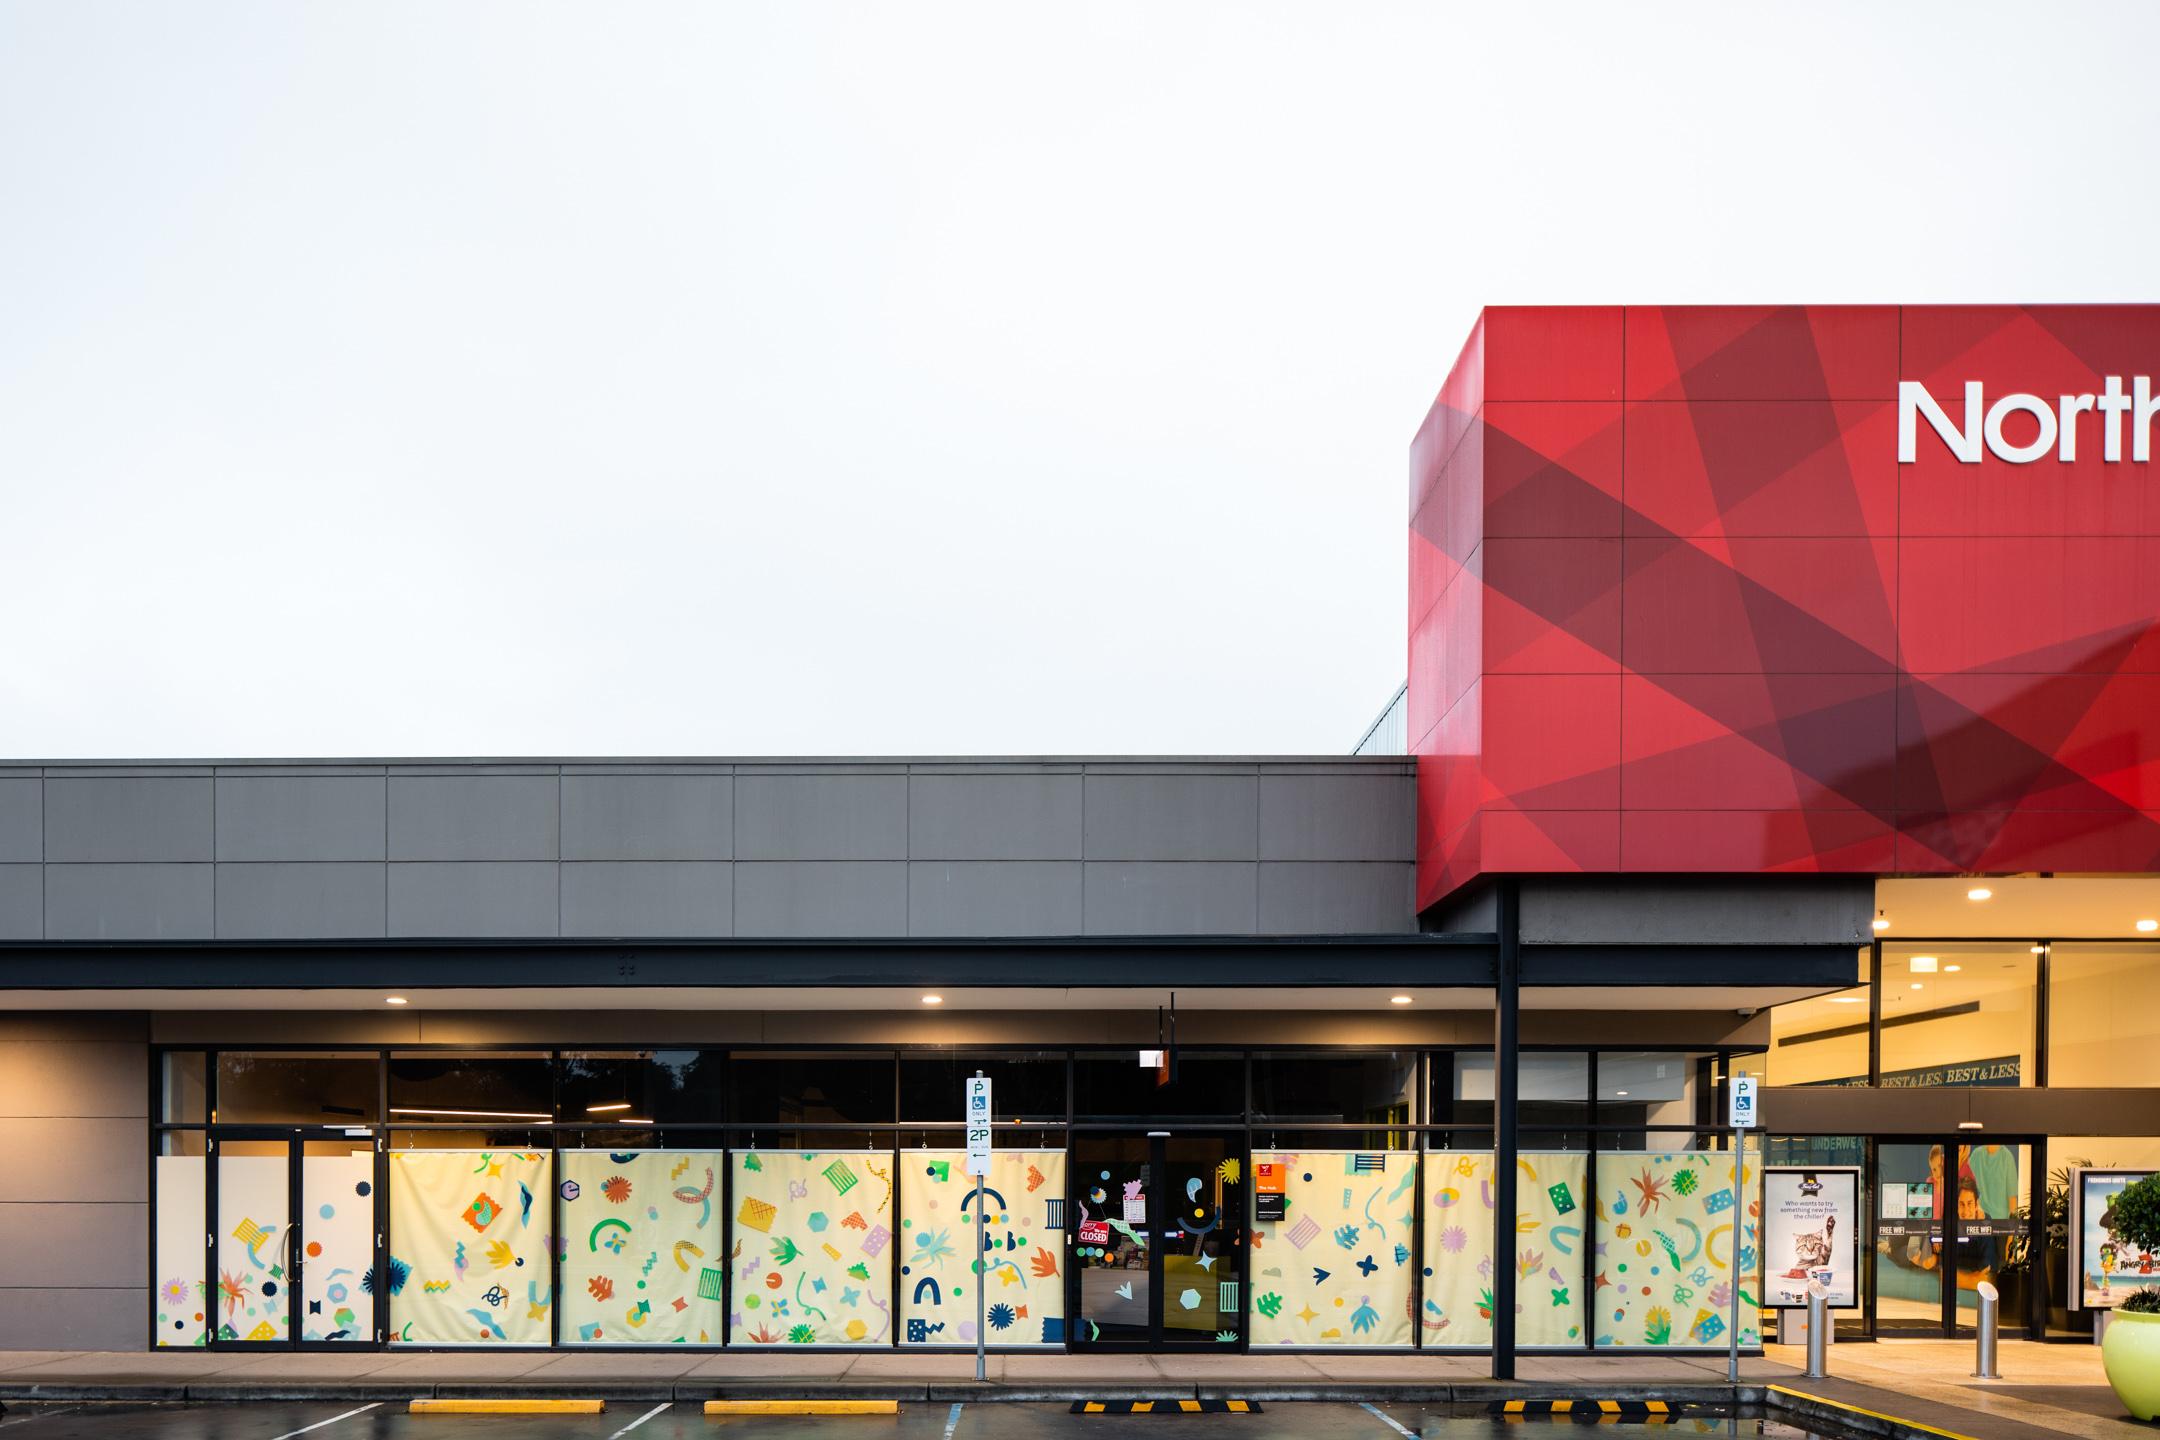 public-journal-the-hub-windows-1